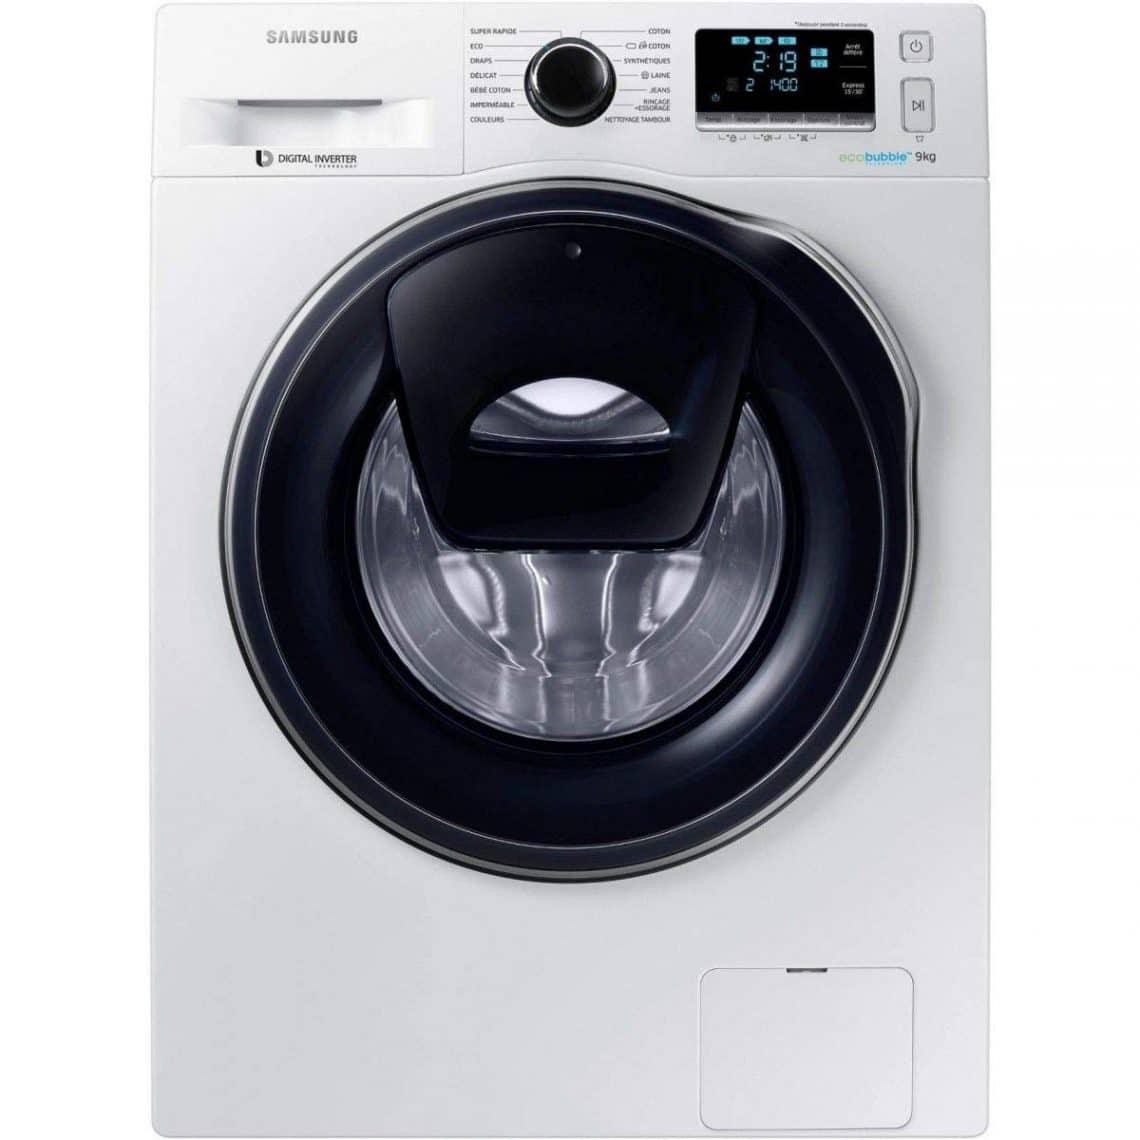 meilleure machine a laver